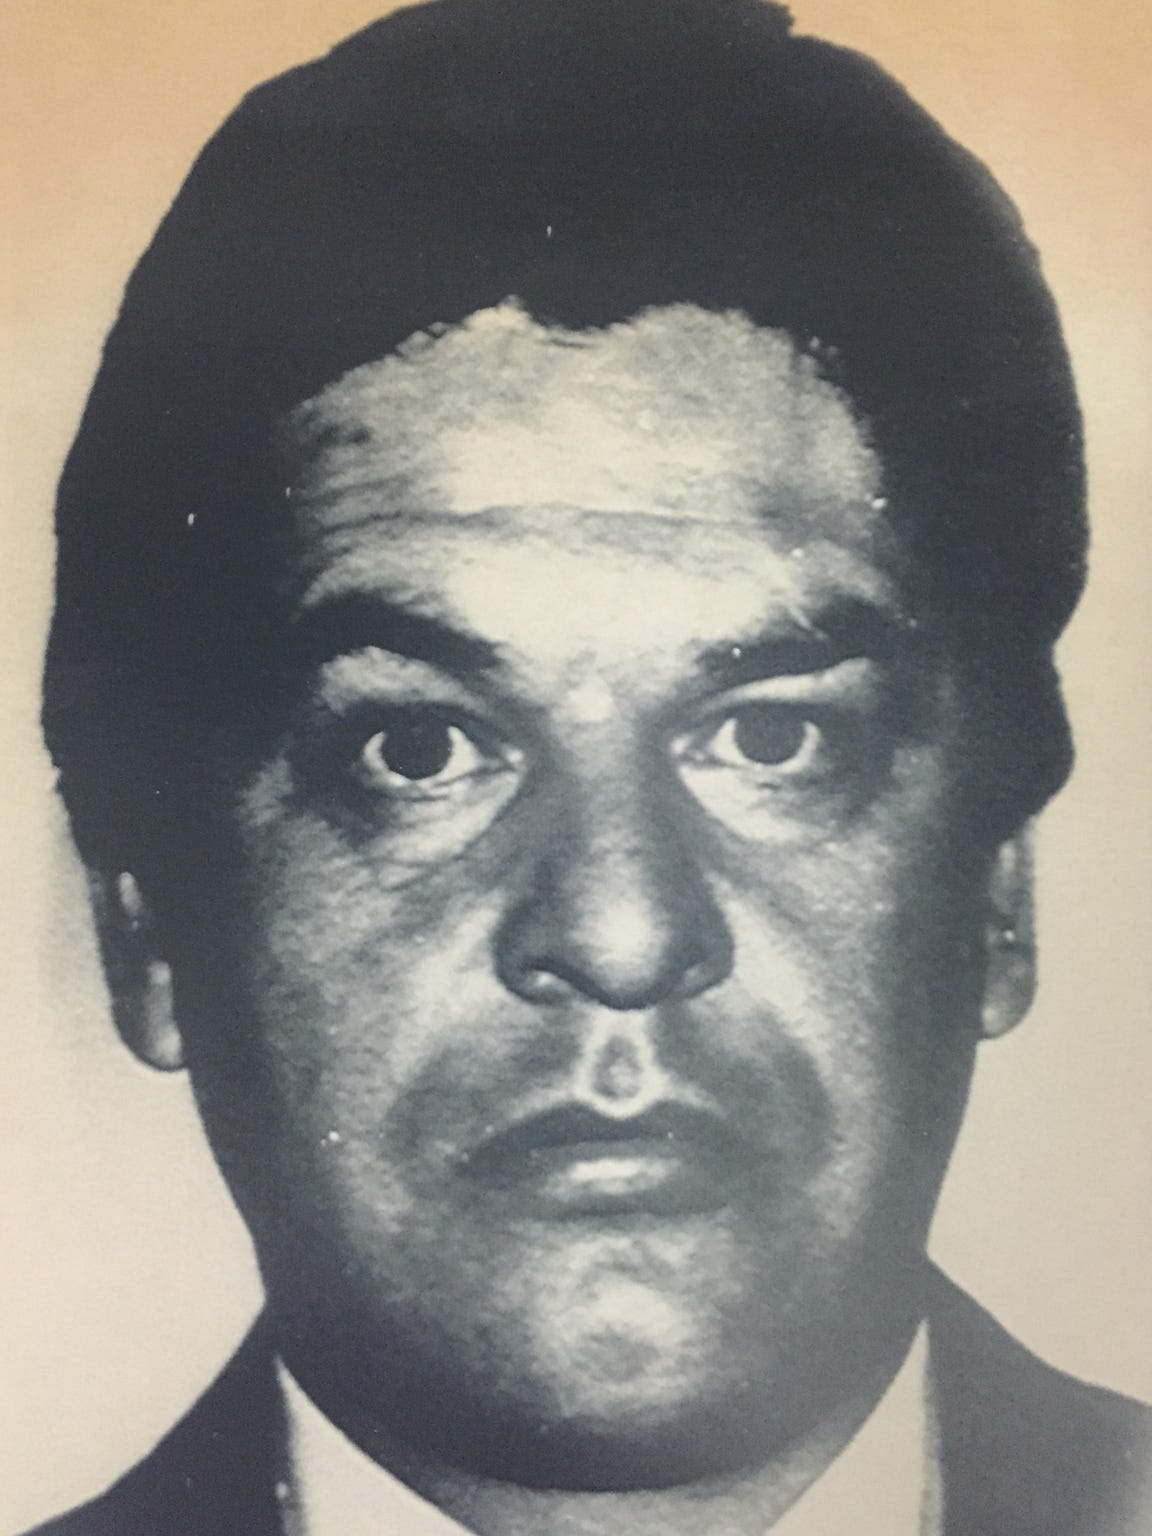 Arturo Durazo Moreno: The story of 'El Negro's' secret